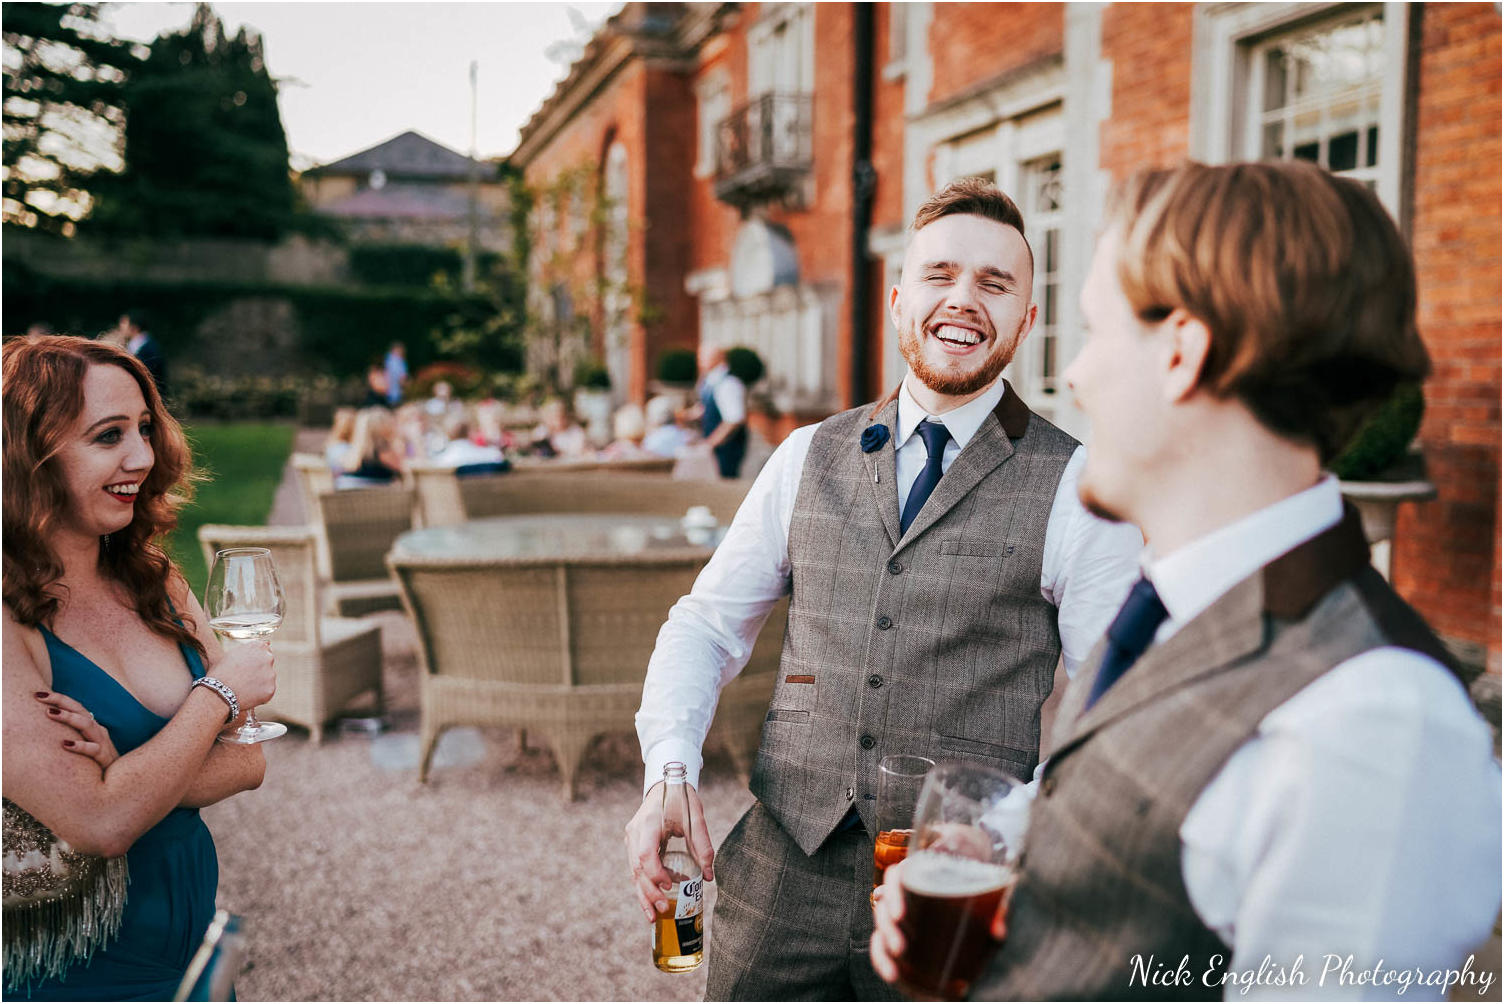 Eaves_Hall_Outdoor_Wedding_Photograph-90.jpg